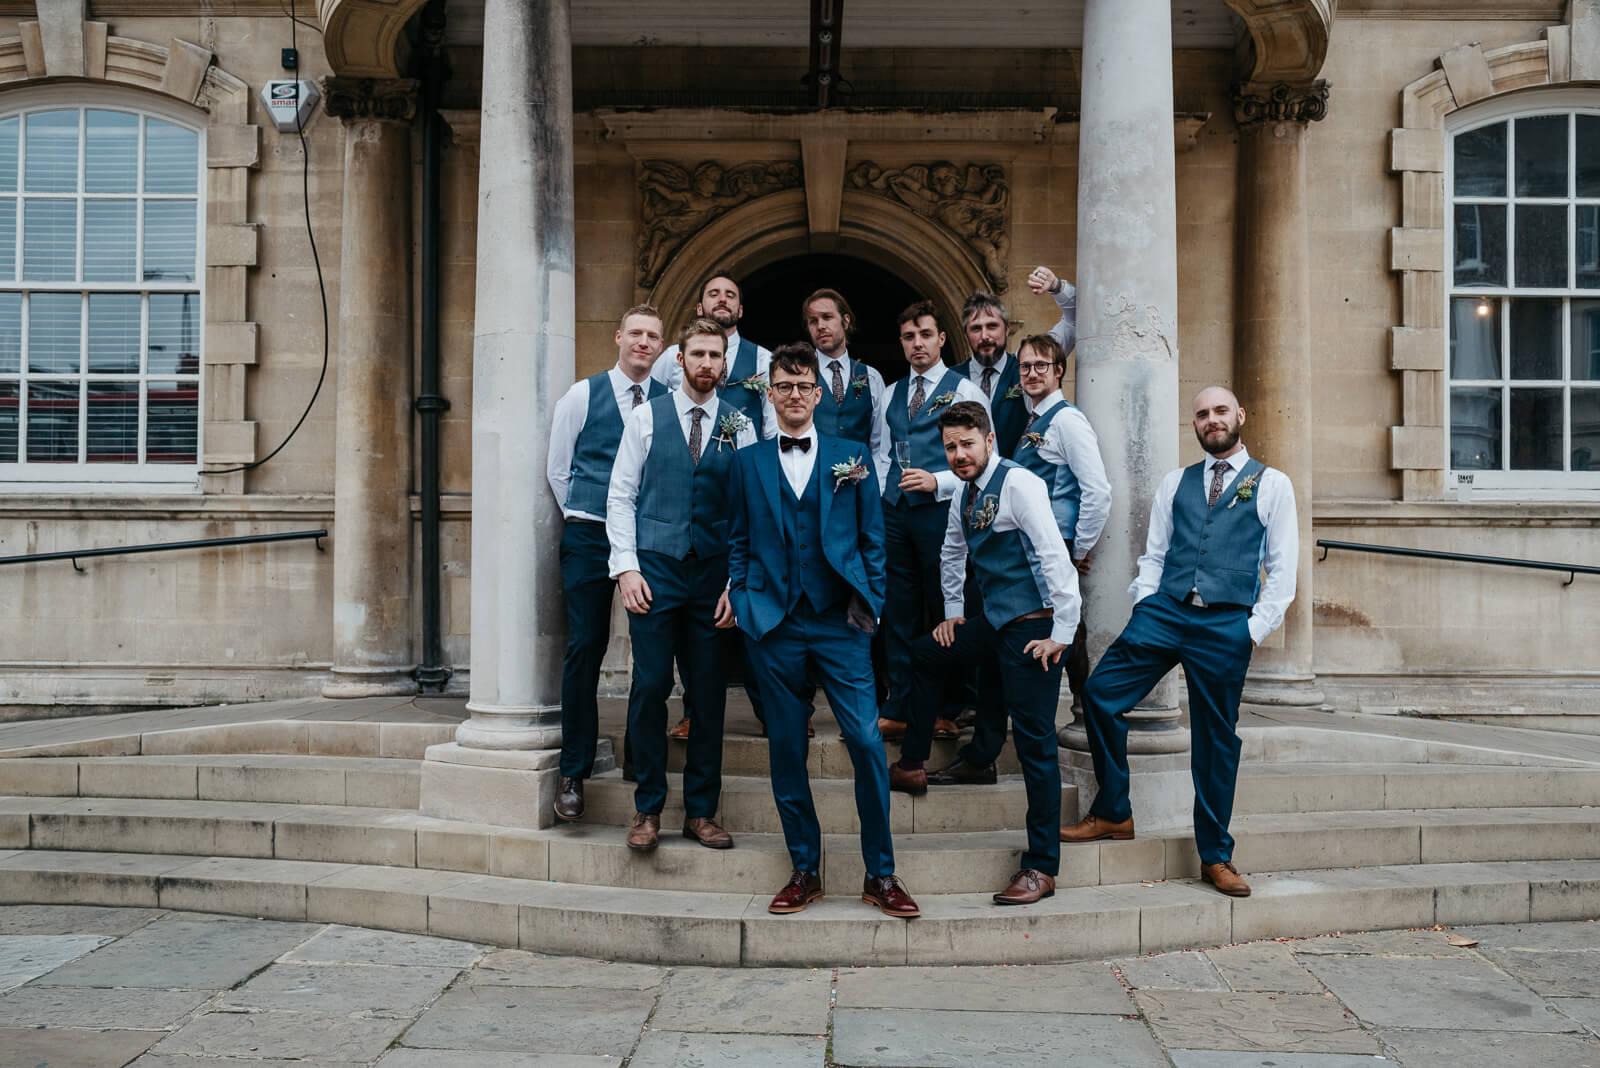 Stylish London groomsmen